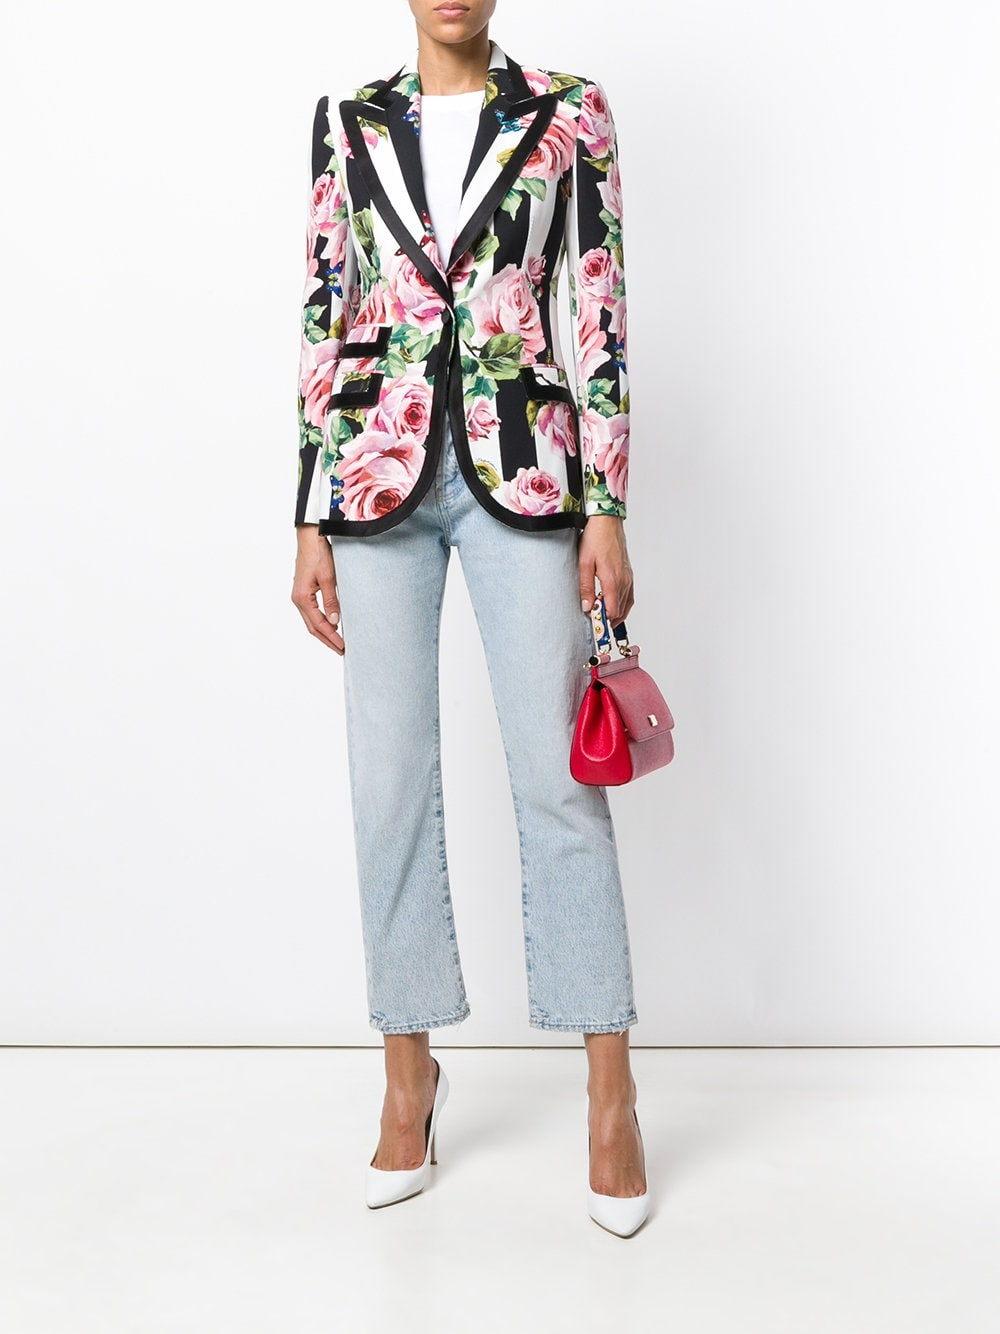 spring style essentials 2018, bold print blazer, dolce & gabbana striped rose print blazer